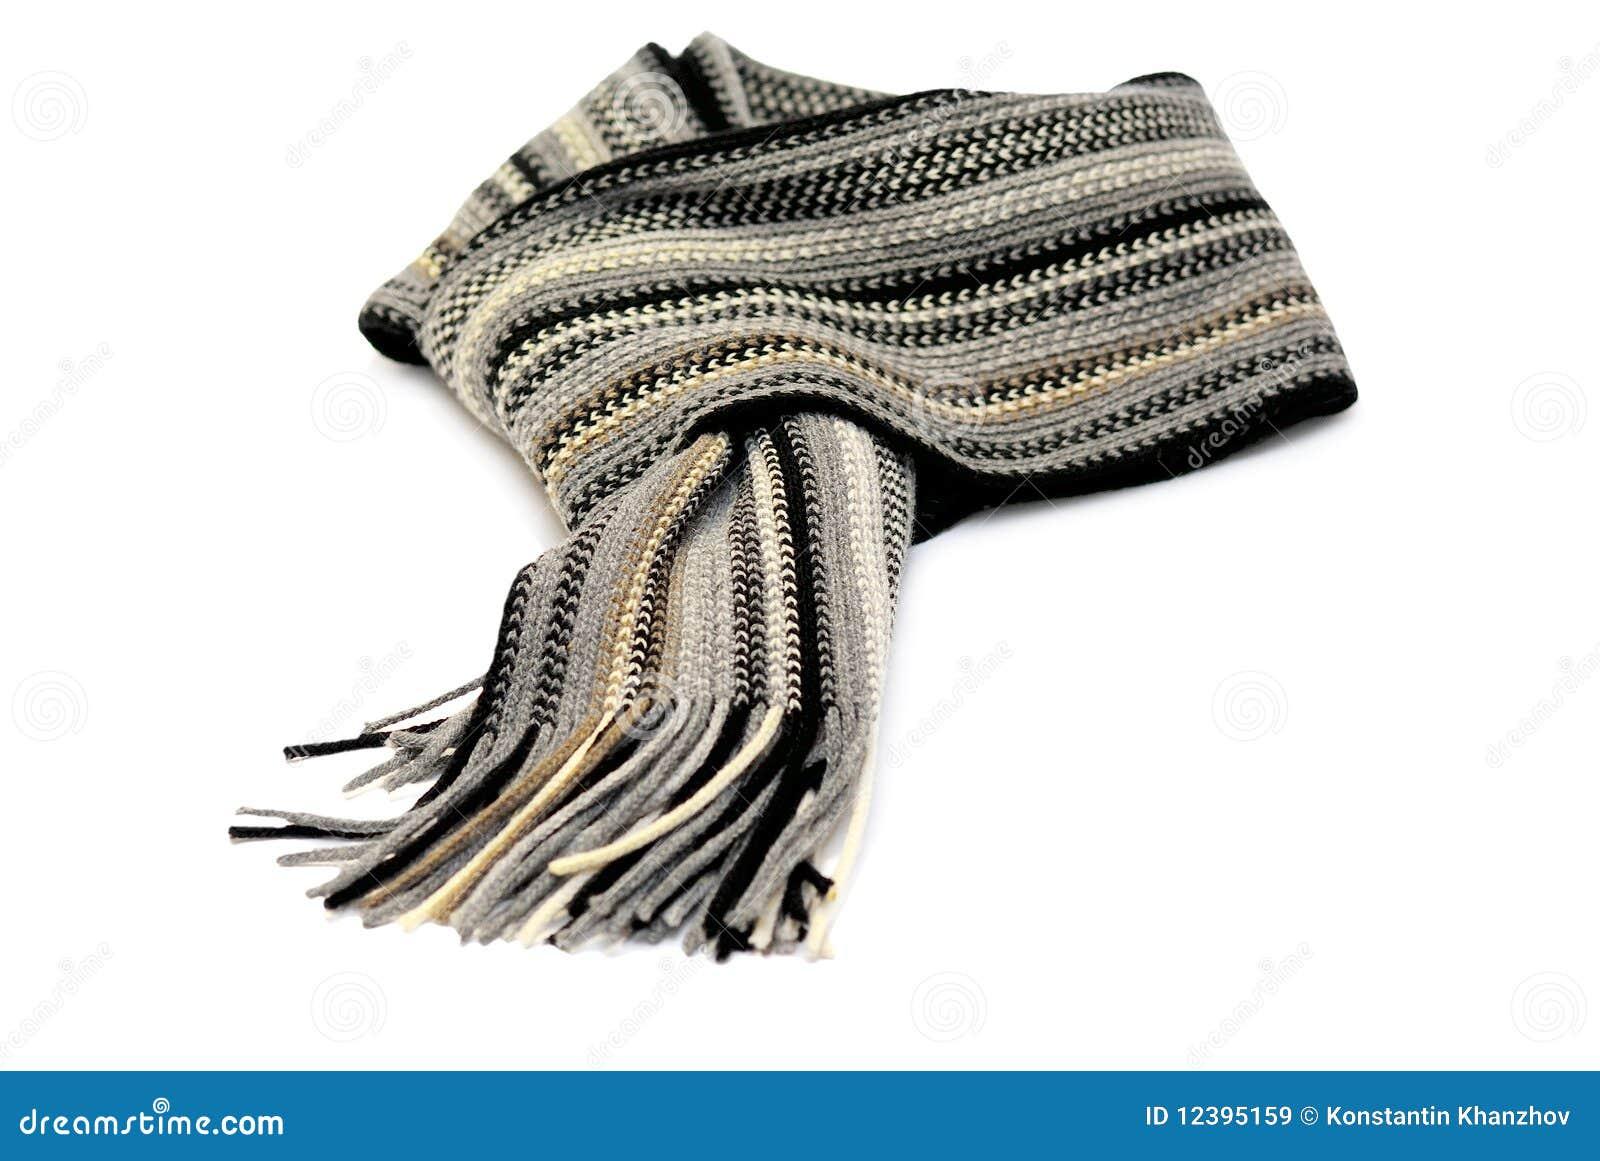 Bufanda anudada aislada sobre blanco